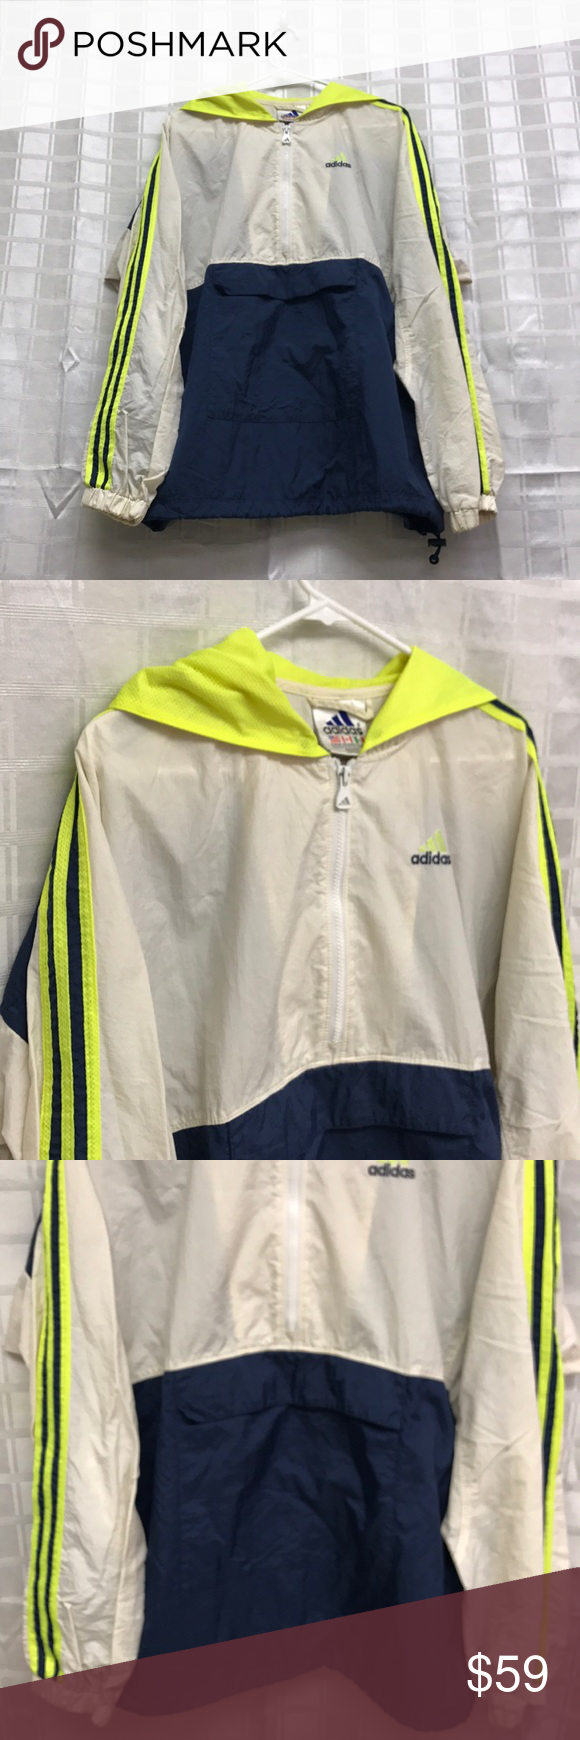 Vintage Adidas Half Zip Pullover Xl neon yellow navy white